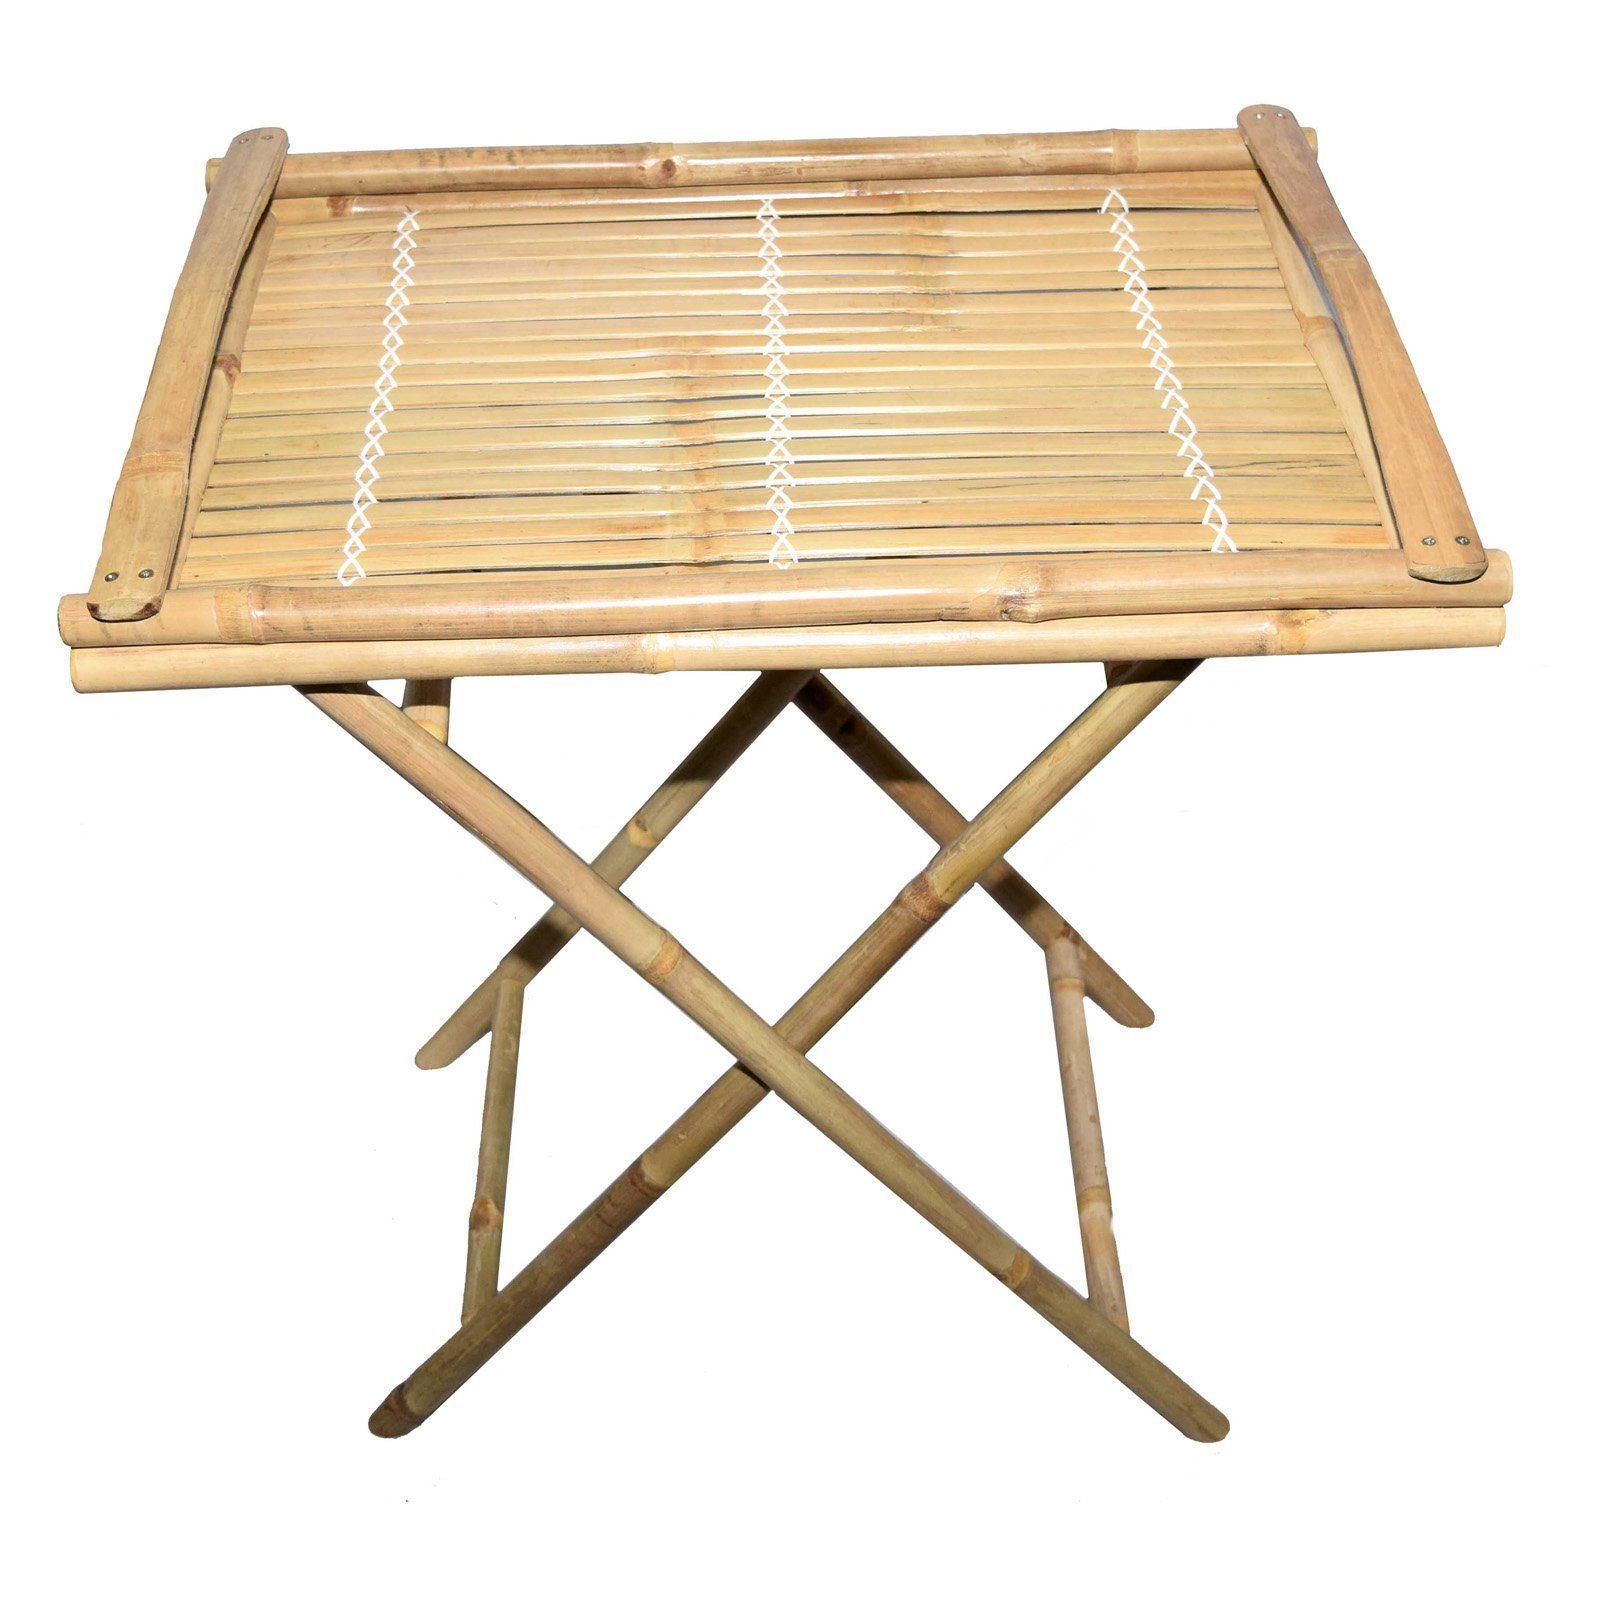 Outdoor Bamboo54 Bamboo Tray Table - 5885